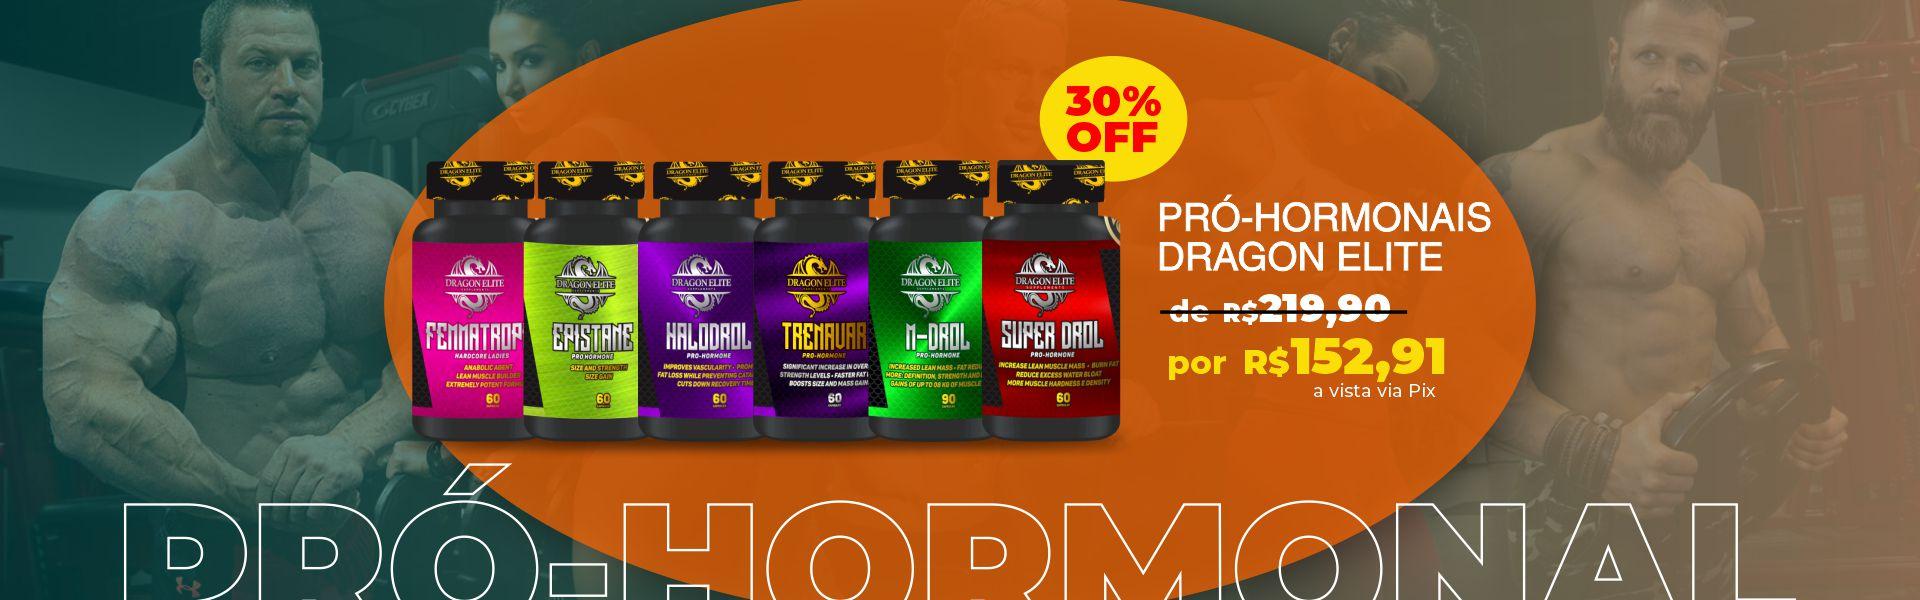 Pro-Hormonal-Dragon-Elite